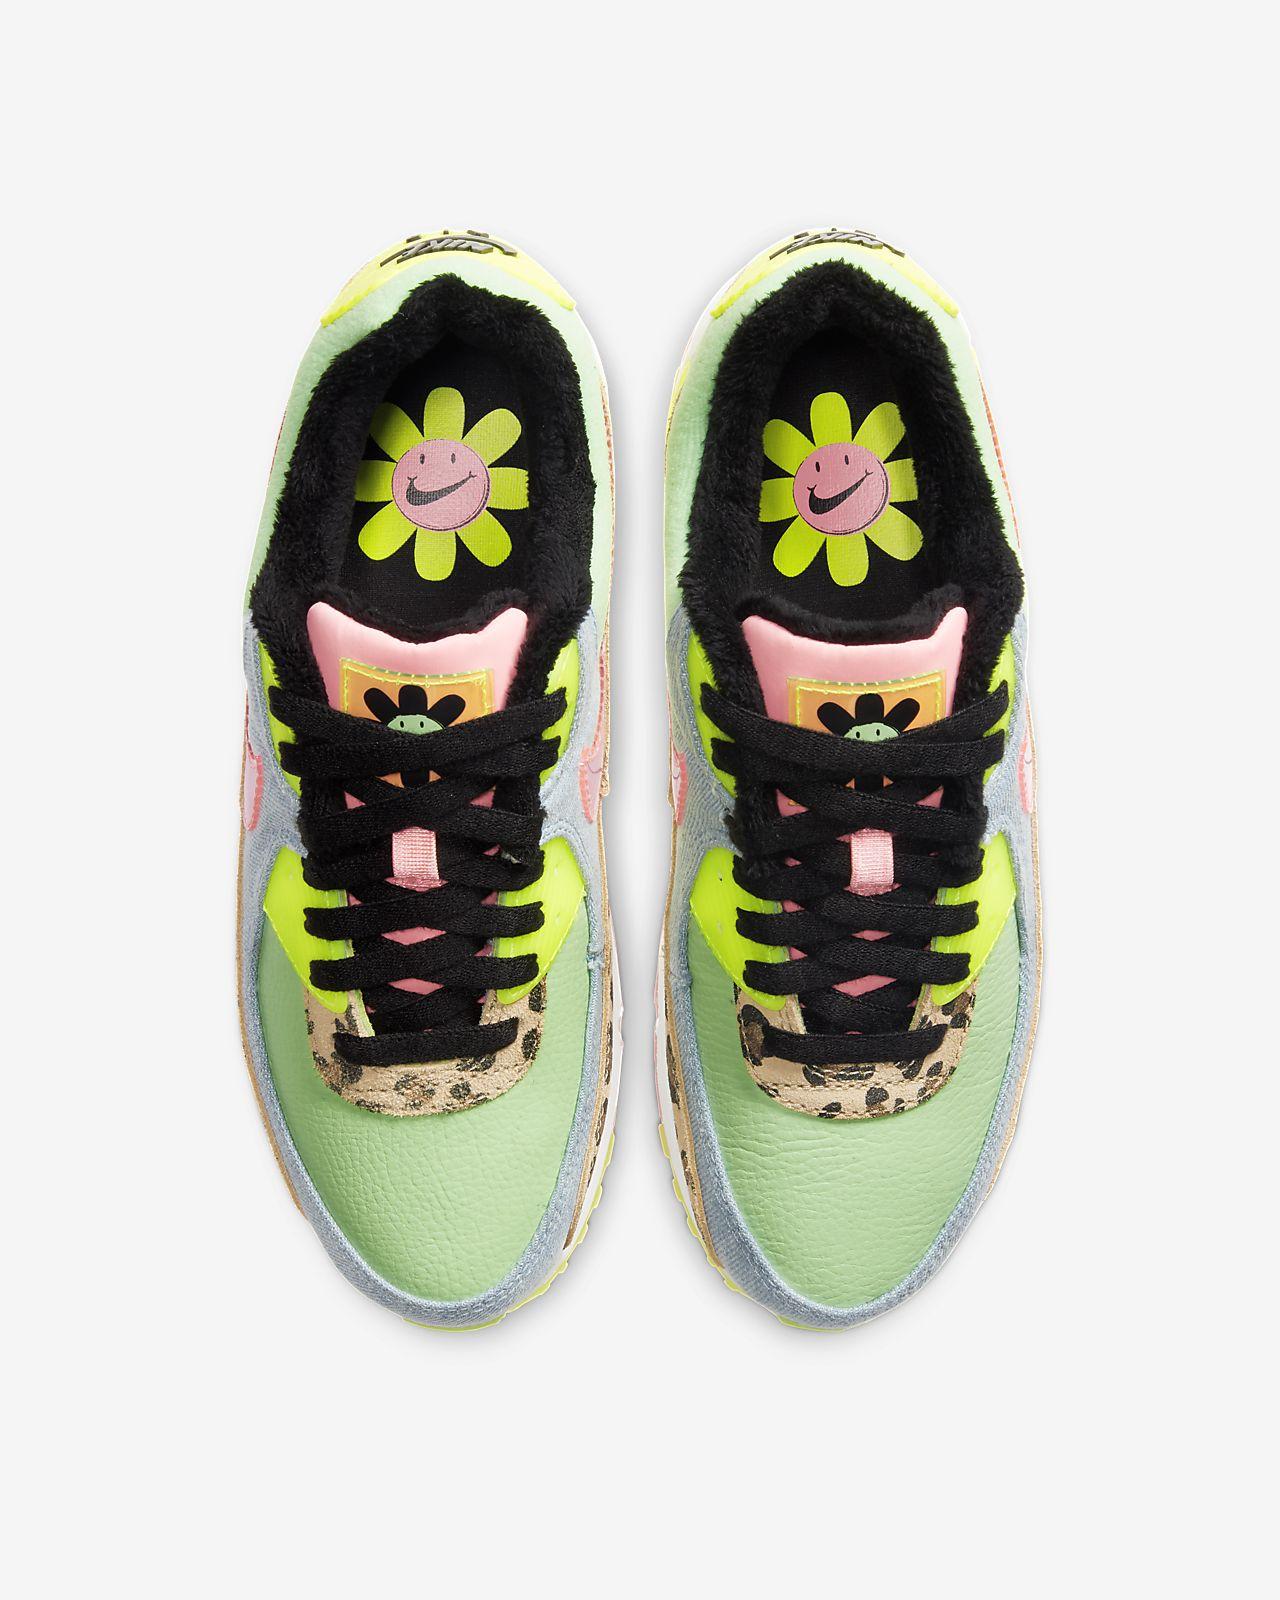 Nike Air Max 90 LX Color: Illusion GreenSunset Pulse Black